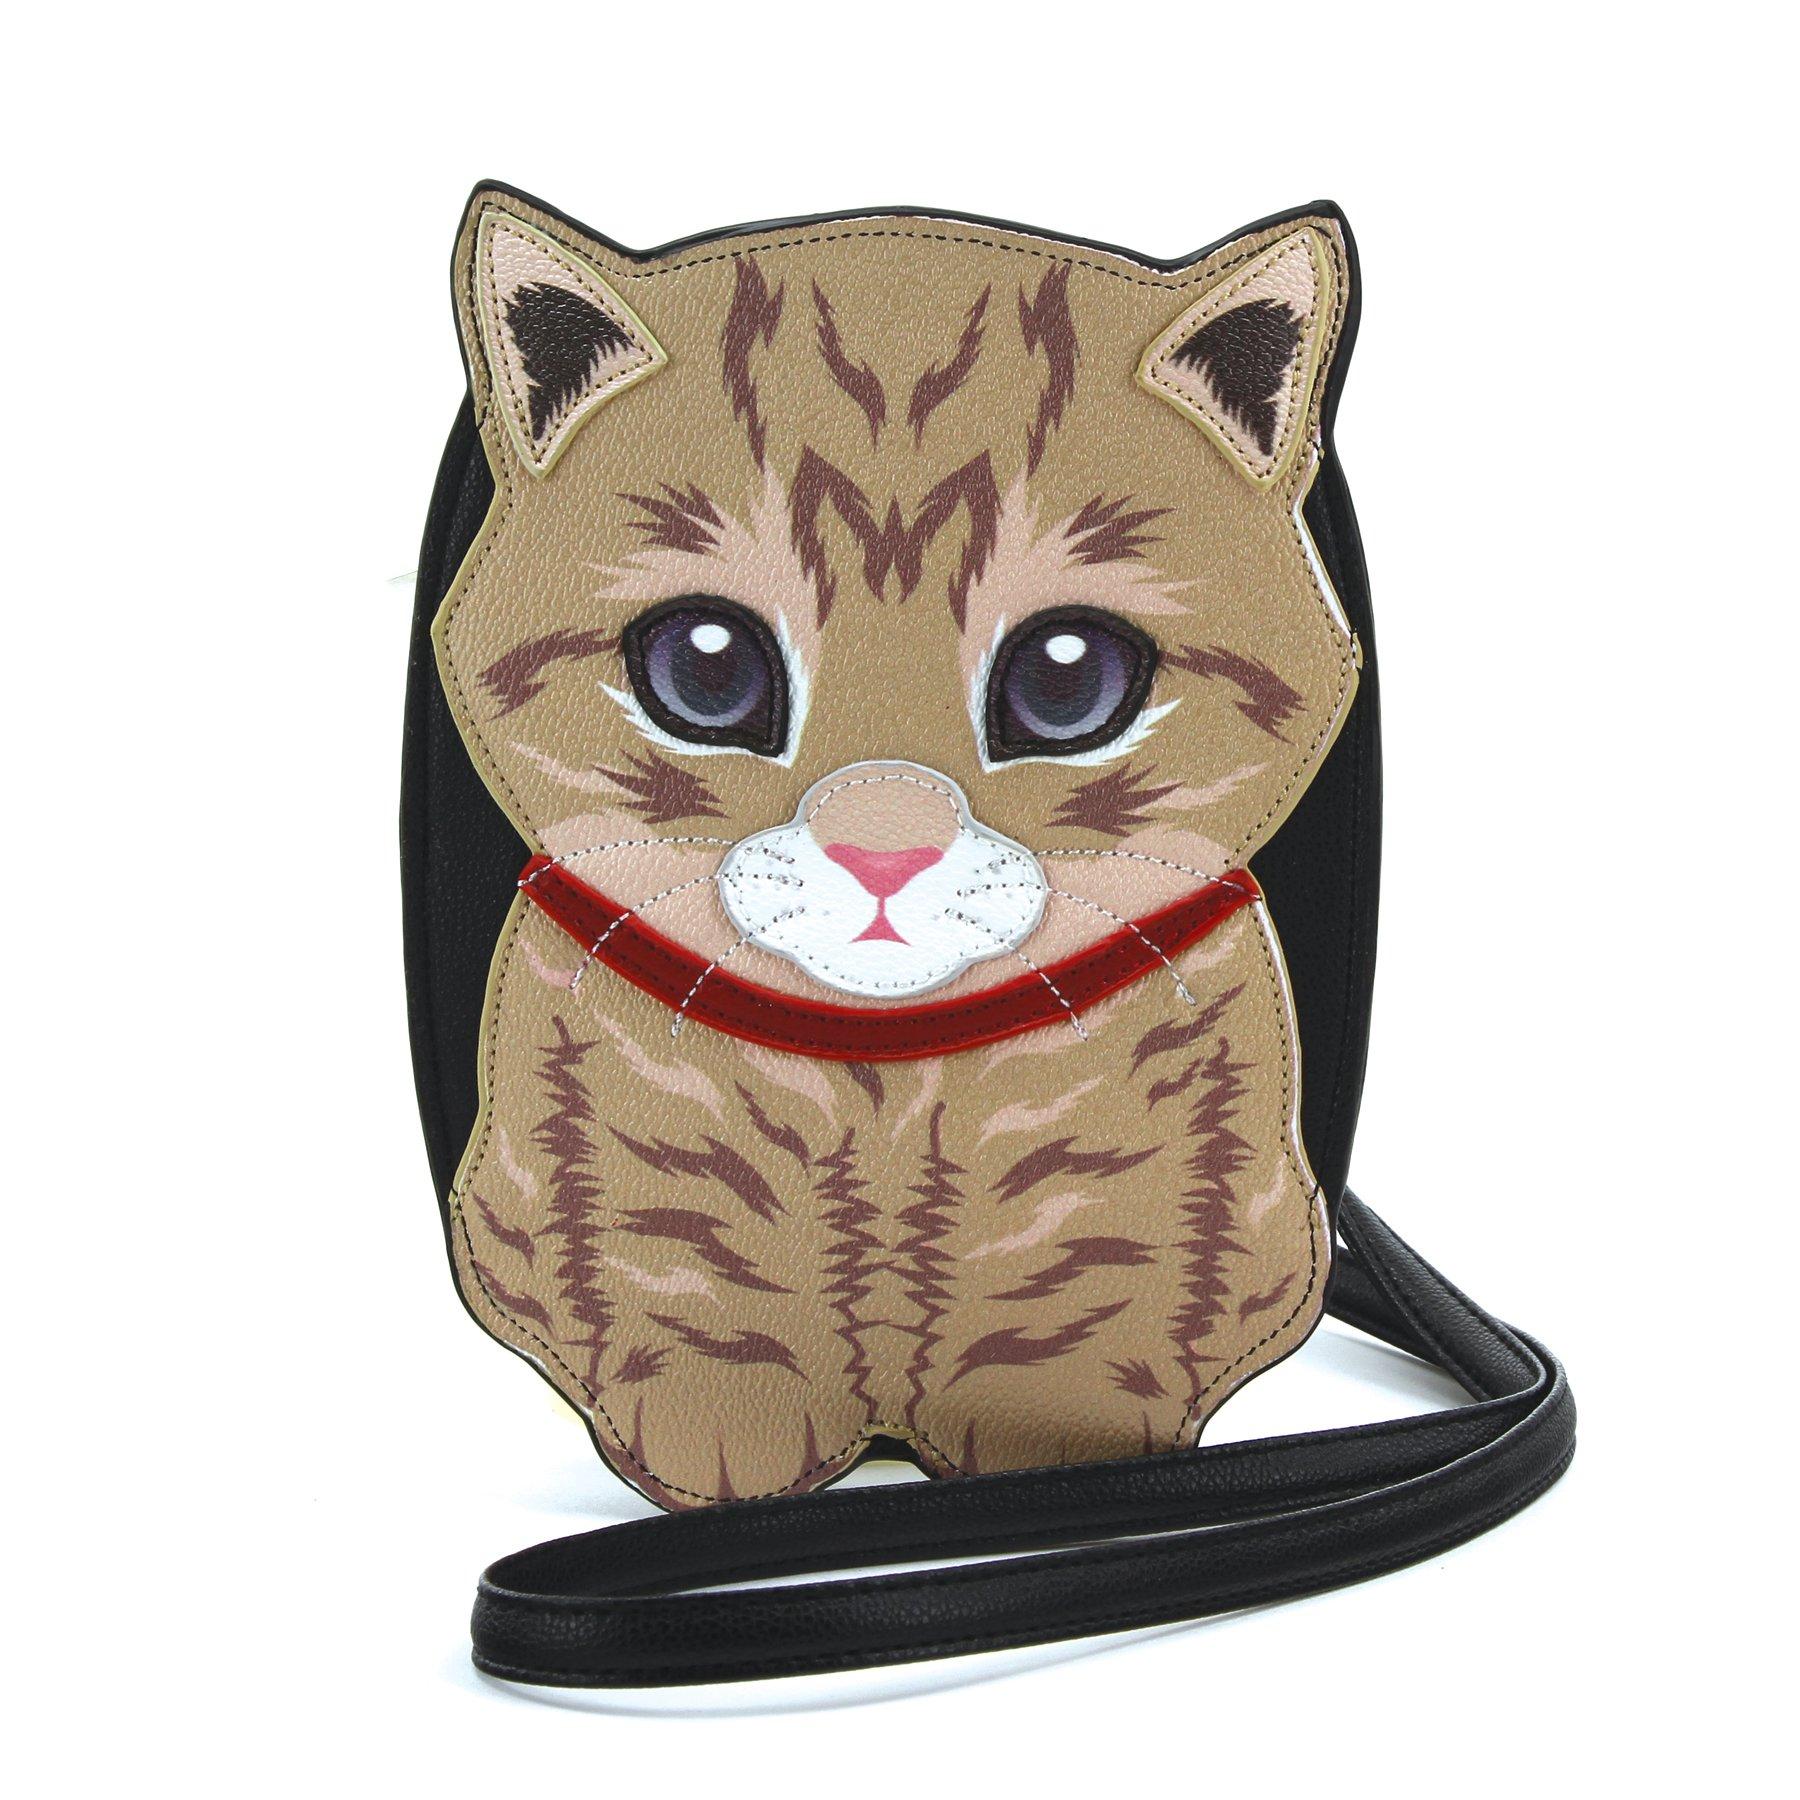 Sleepyville Critters - Tabby Cat Cross Body Bag in Vinyl Material